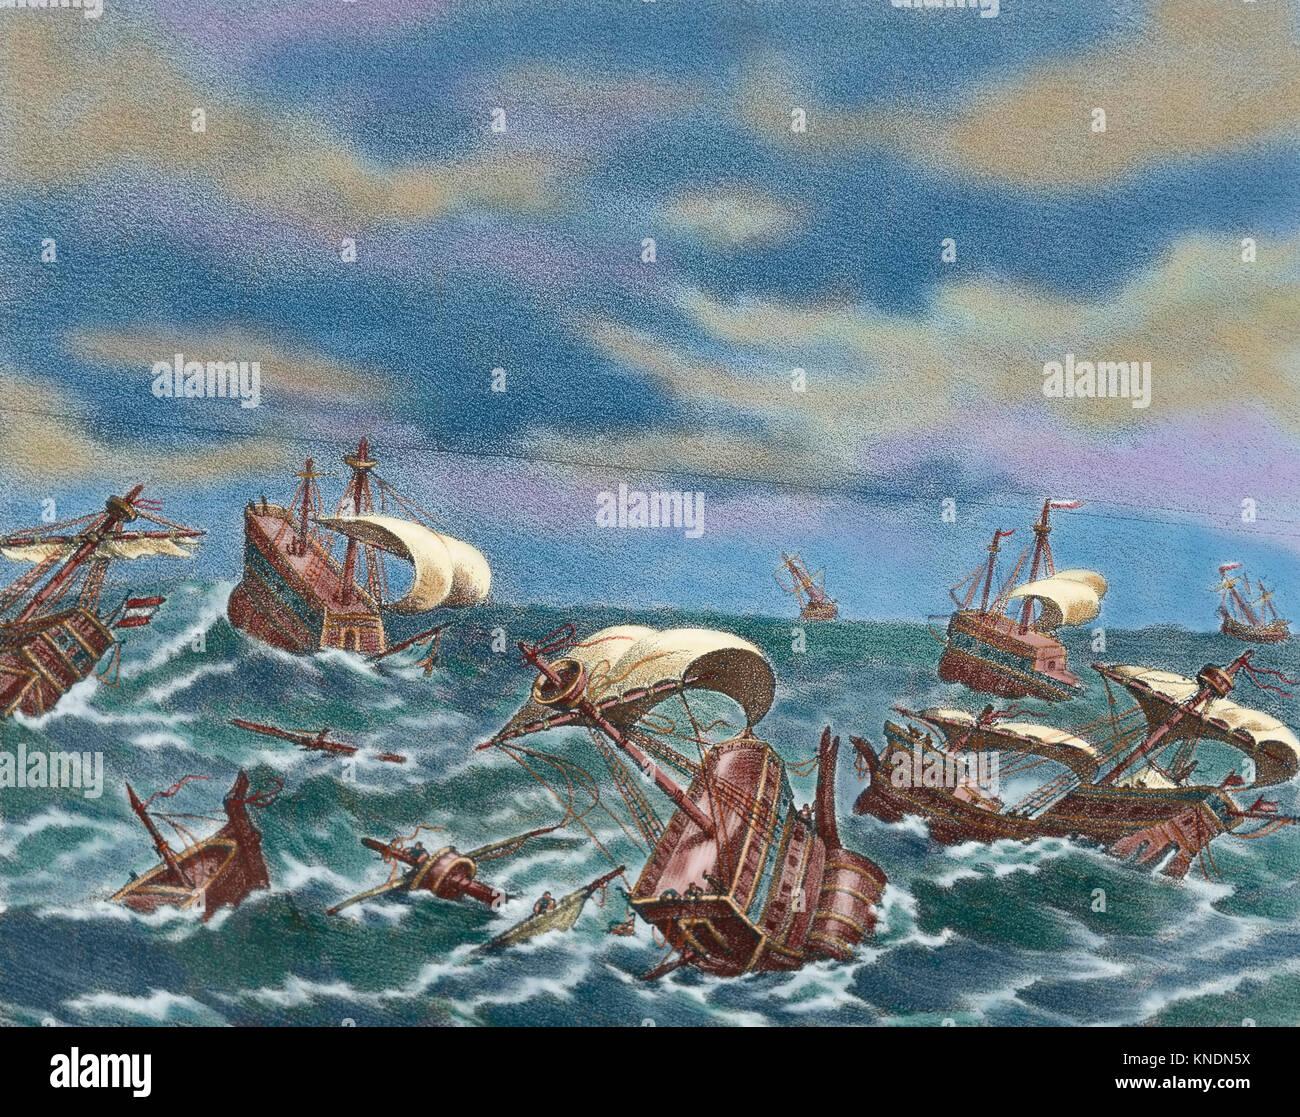 Spanish Armada. Spanish fleet sent by Spanish king Philip II (1527-1598) against England in 1588, under the command - Stock Image